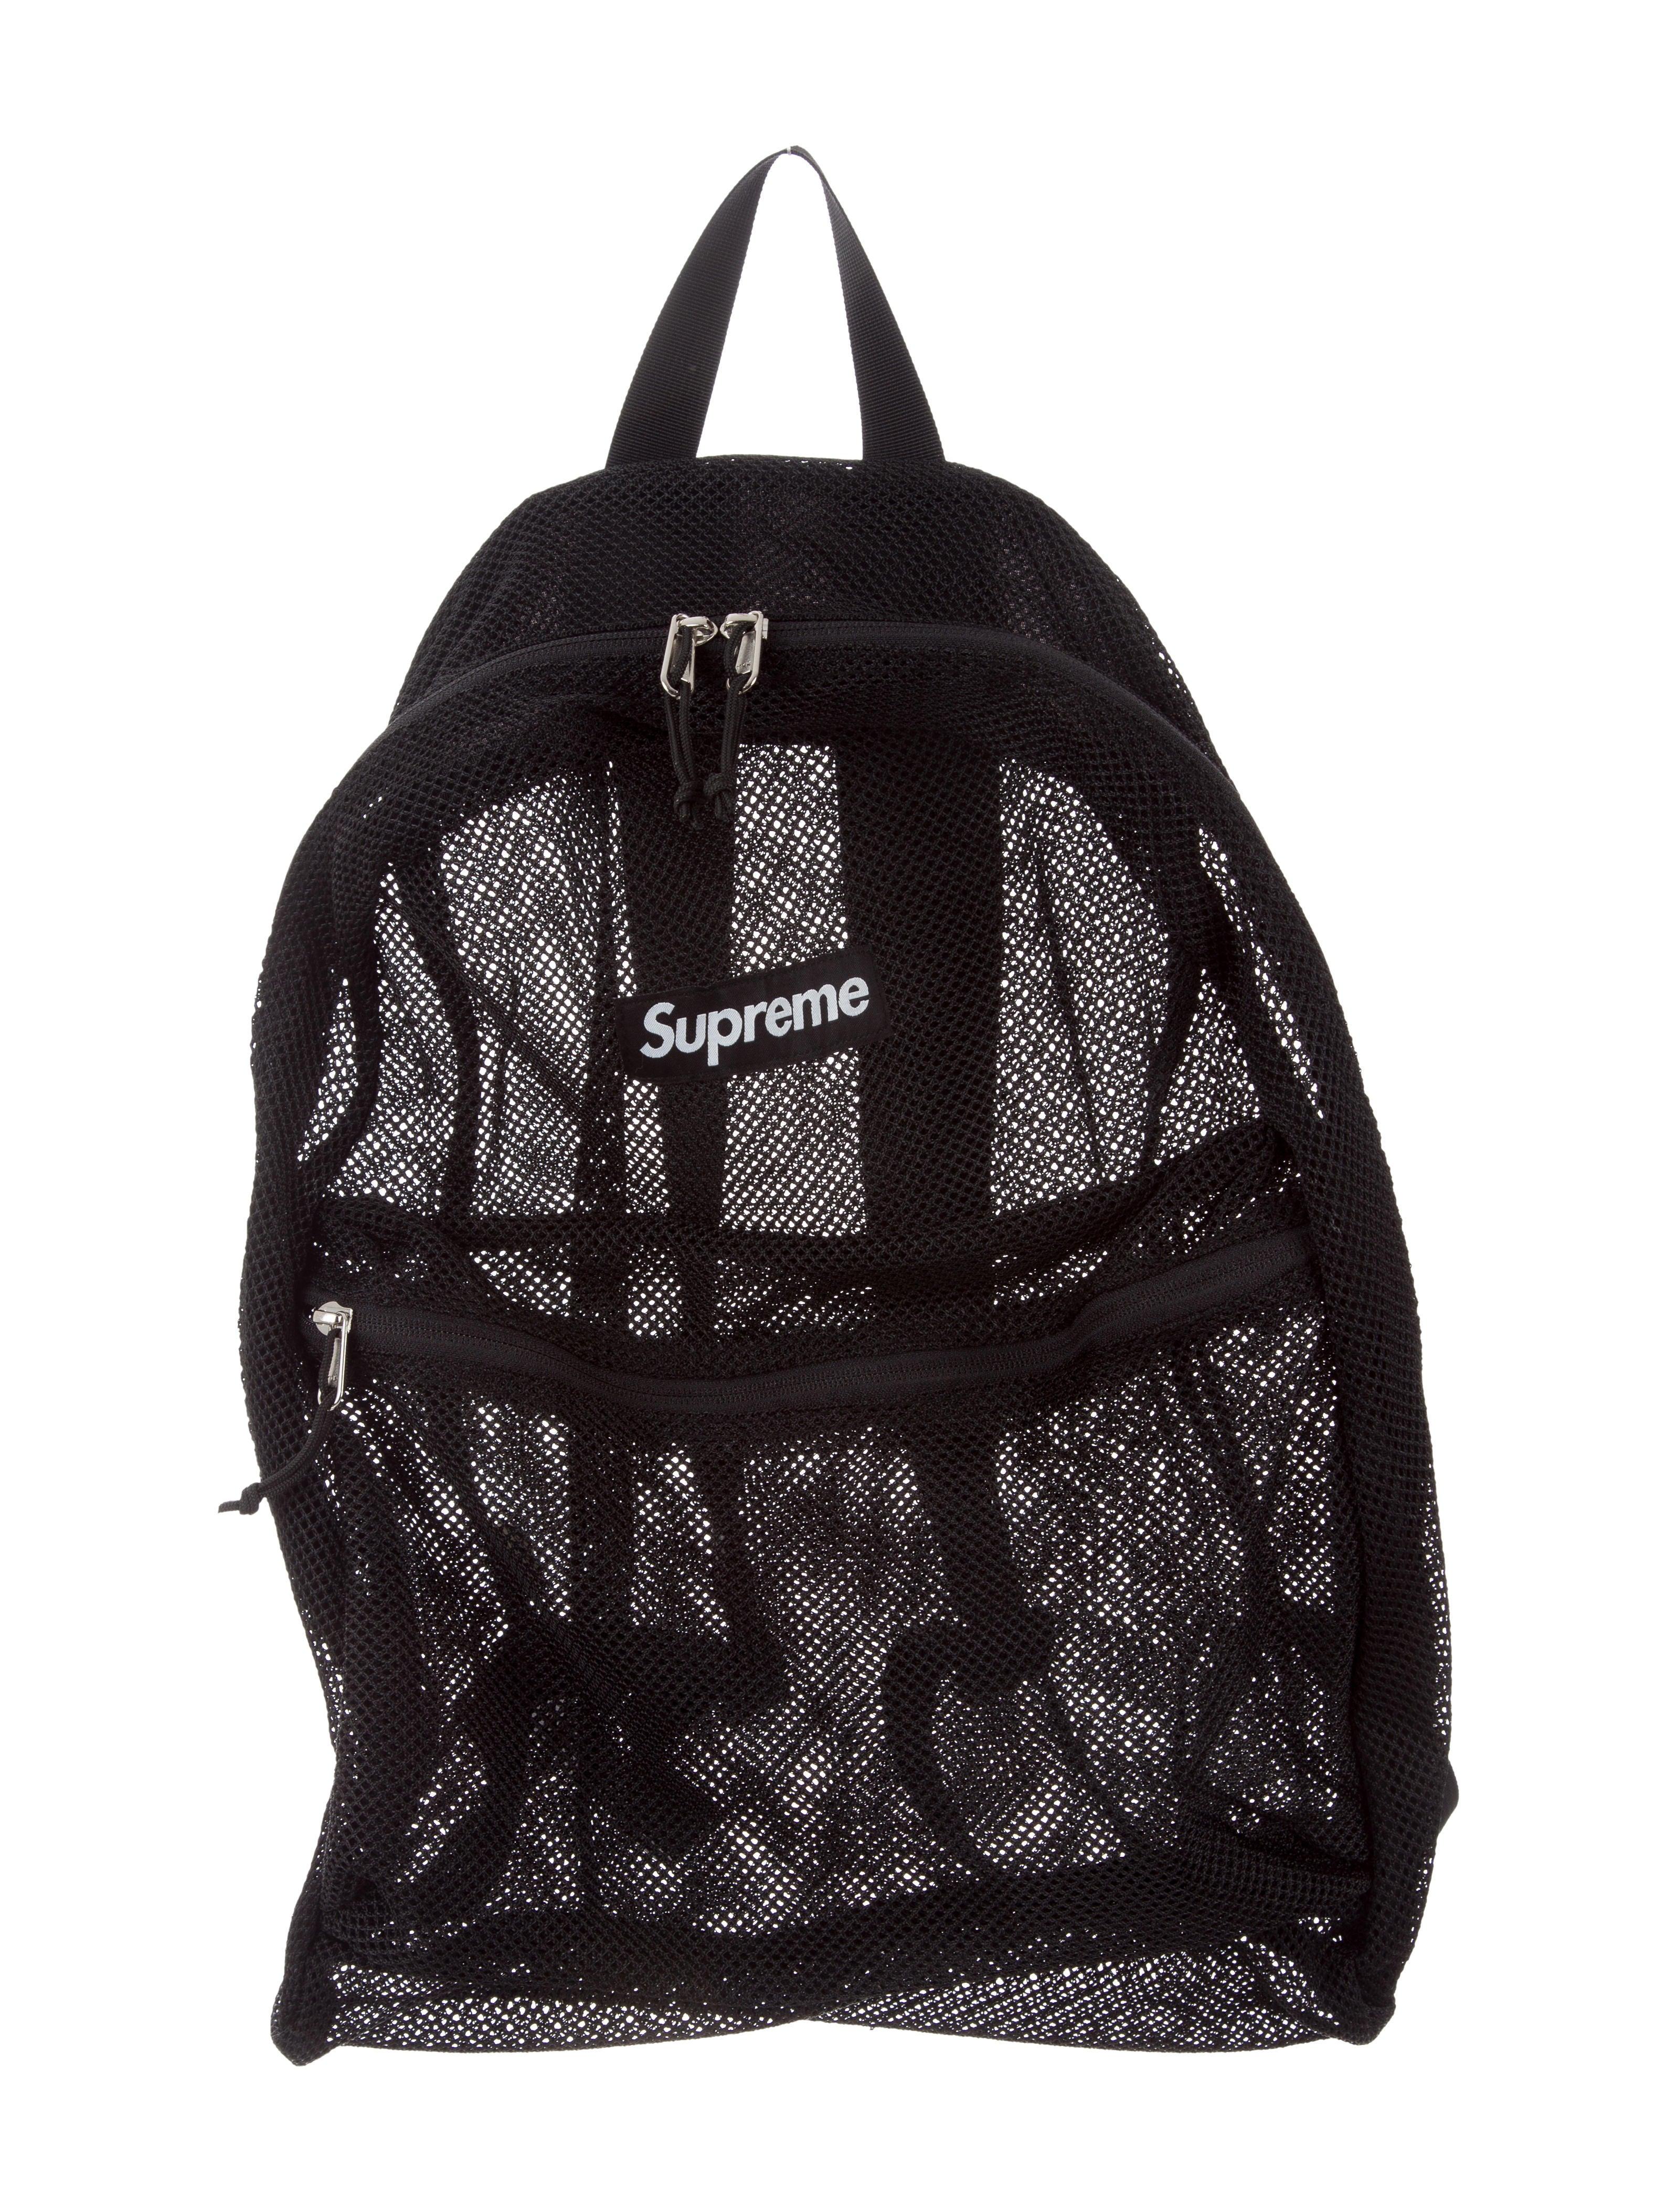 3fa65e70b8 Supreme 2016 Box Logo Mesh Backpack - Bags - WSPME21265 | The RealReal